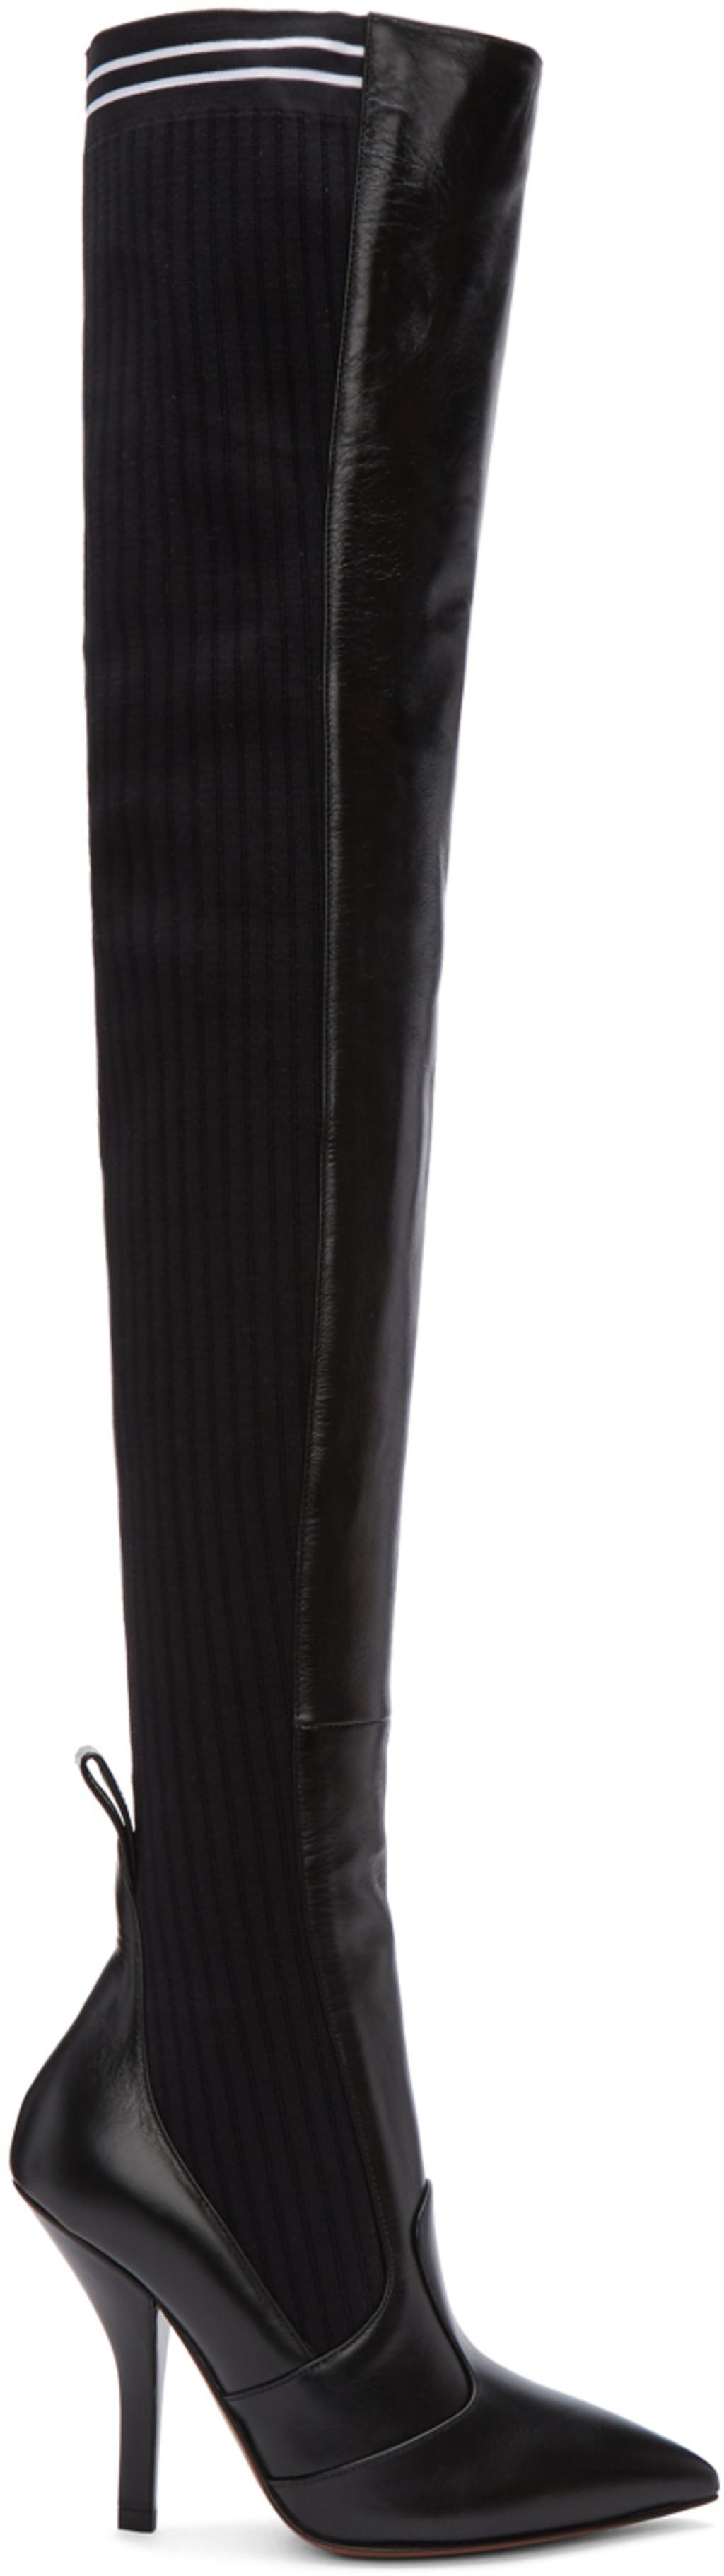 Prada Black Mexas Knee-High Boots OA8BOY